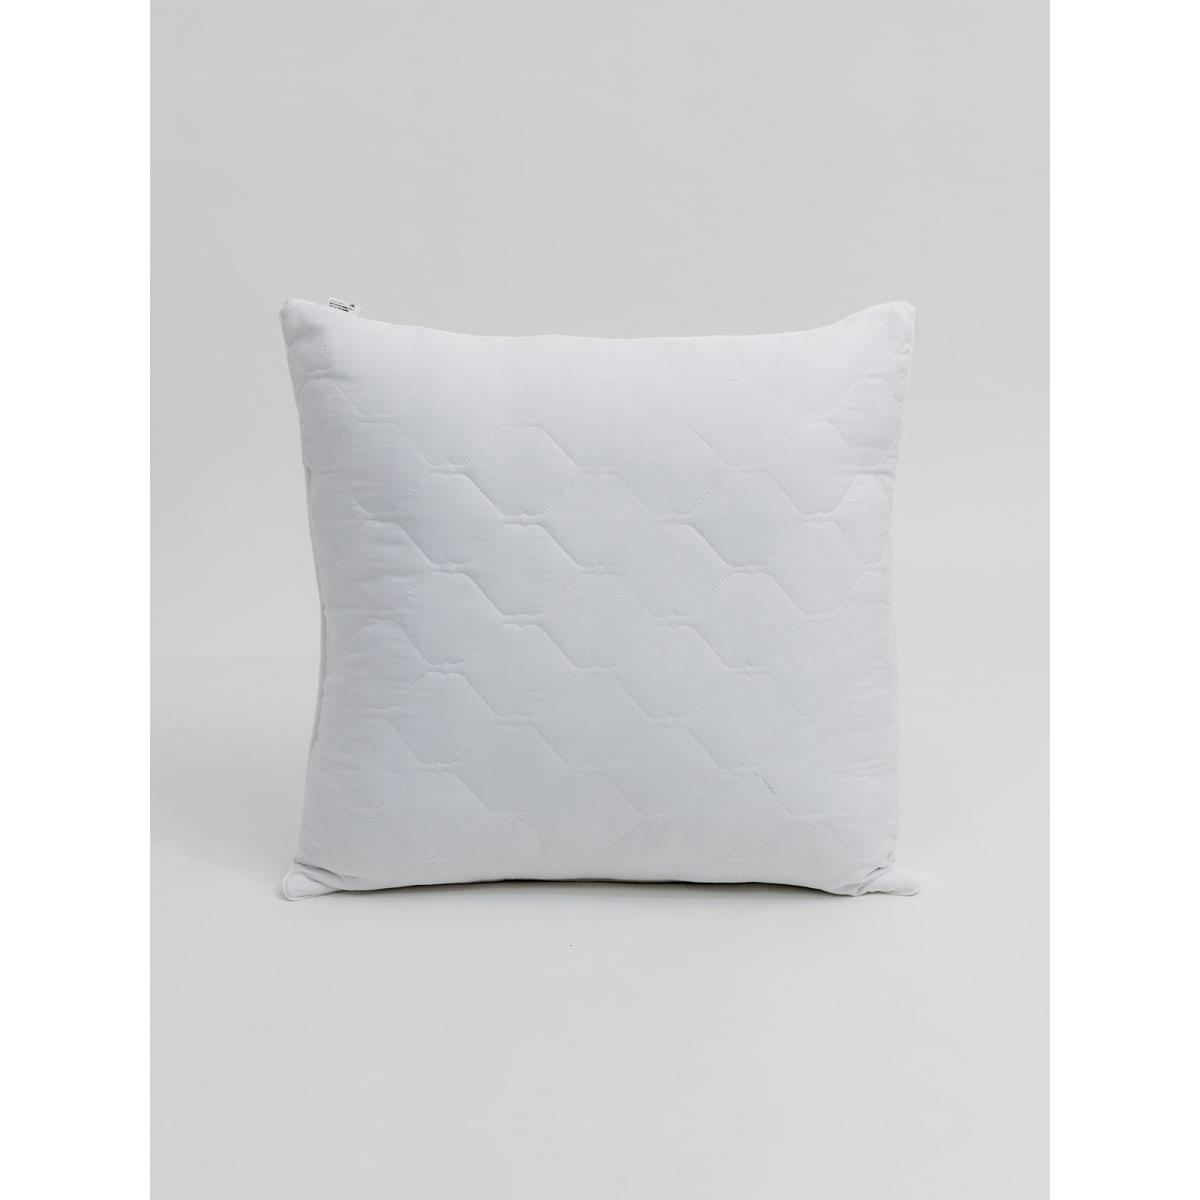 Подушка Selena Crinkle line 70х70 см, искусственный пух, цвет белый